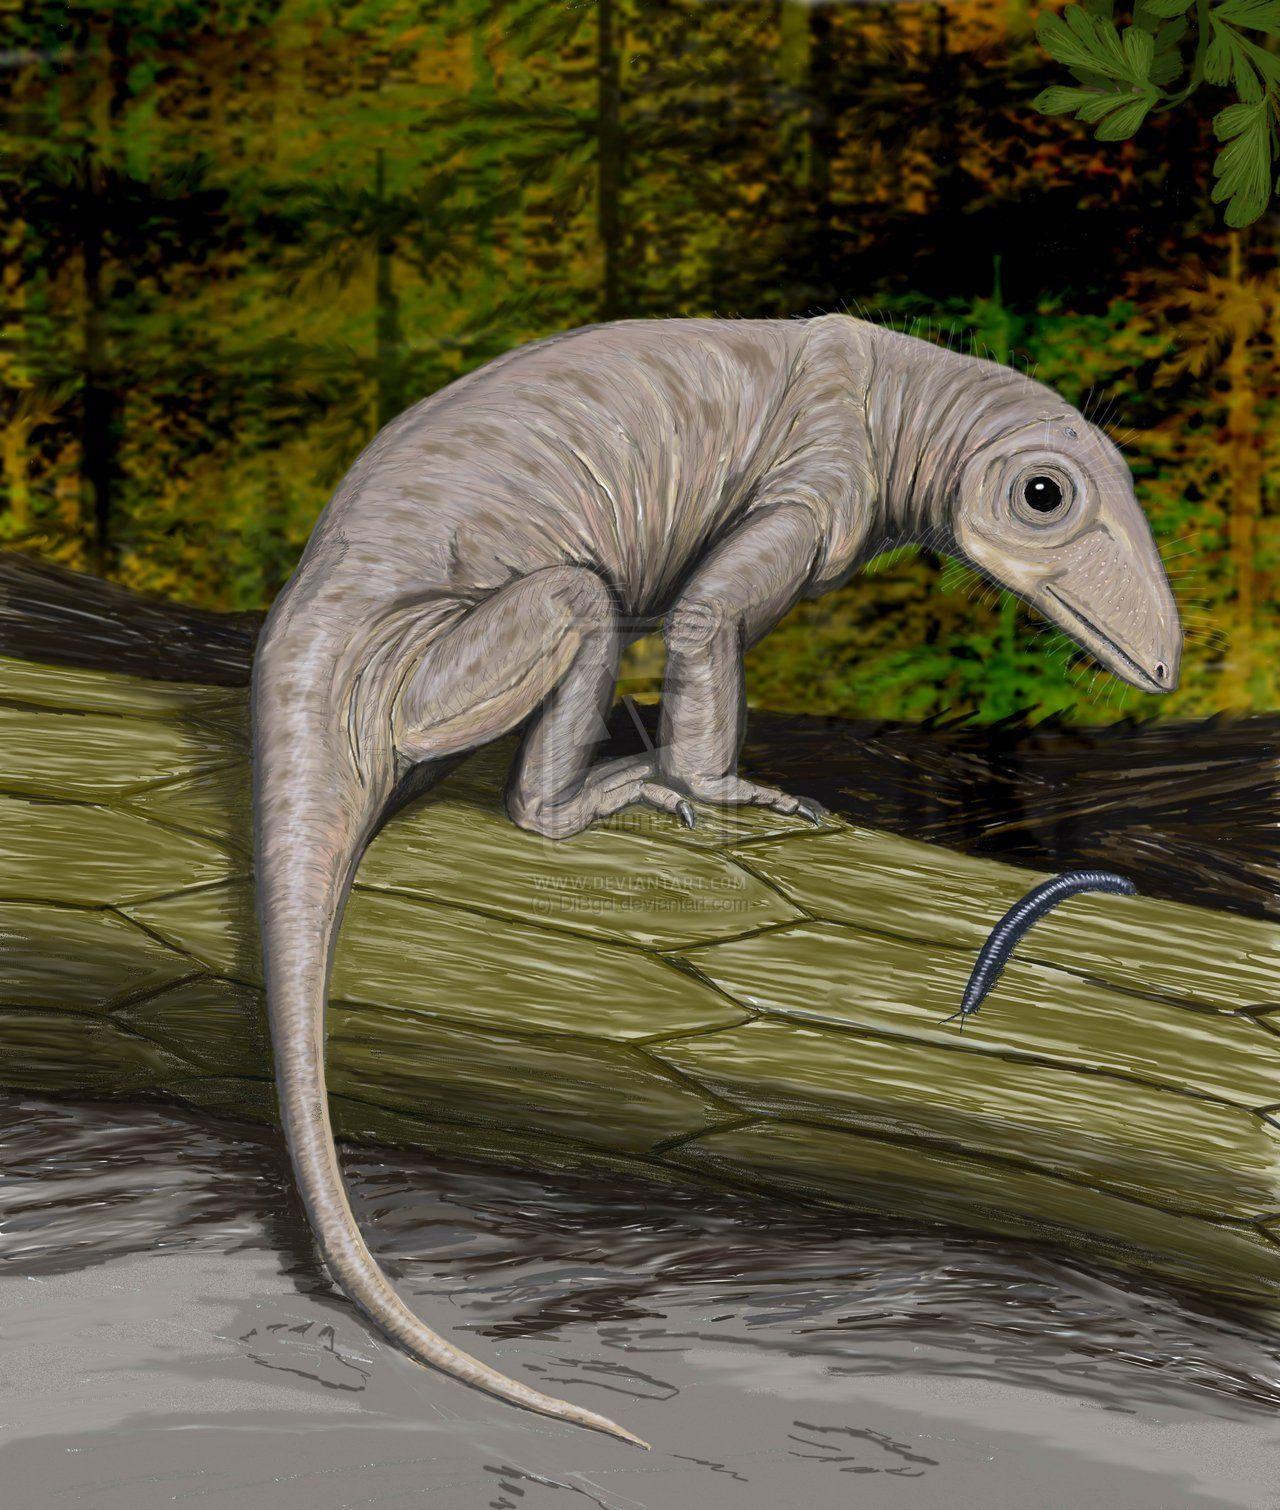 Dibgd S Deviantart Gallery Prehistoric Creatures Extinct Animals Paleo Art